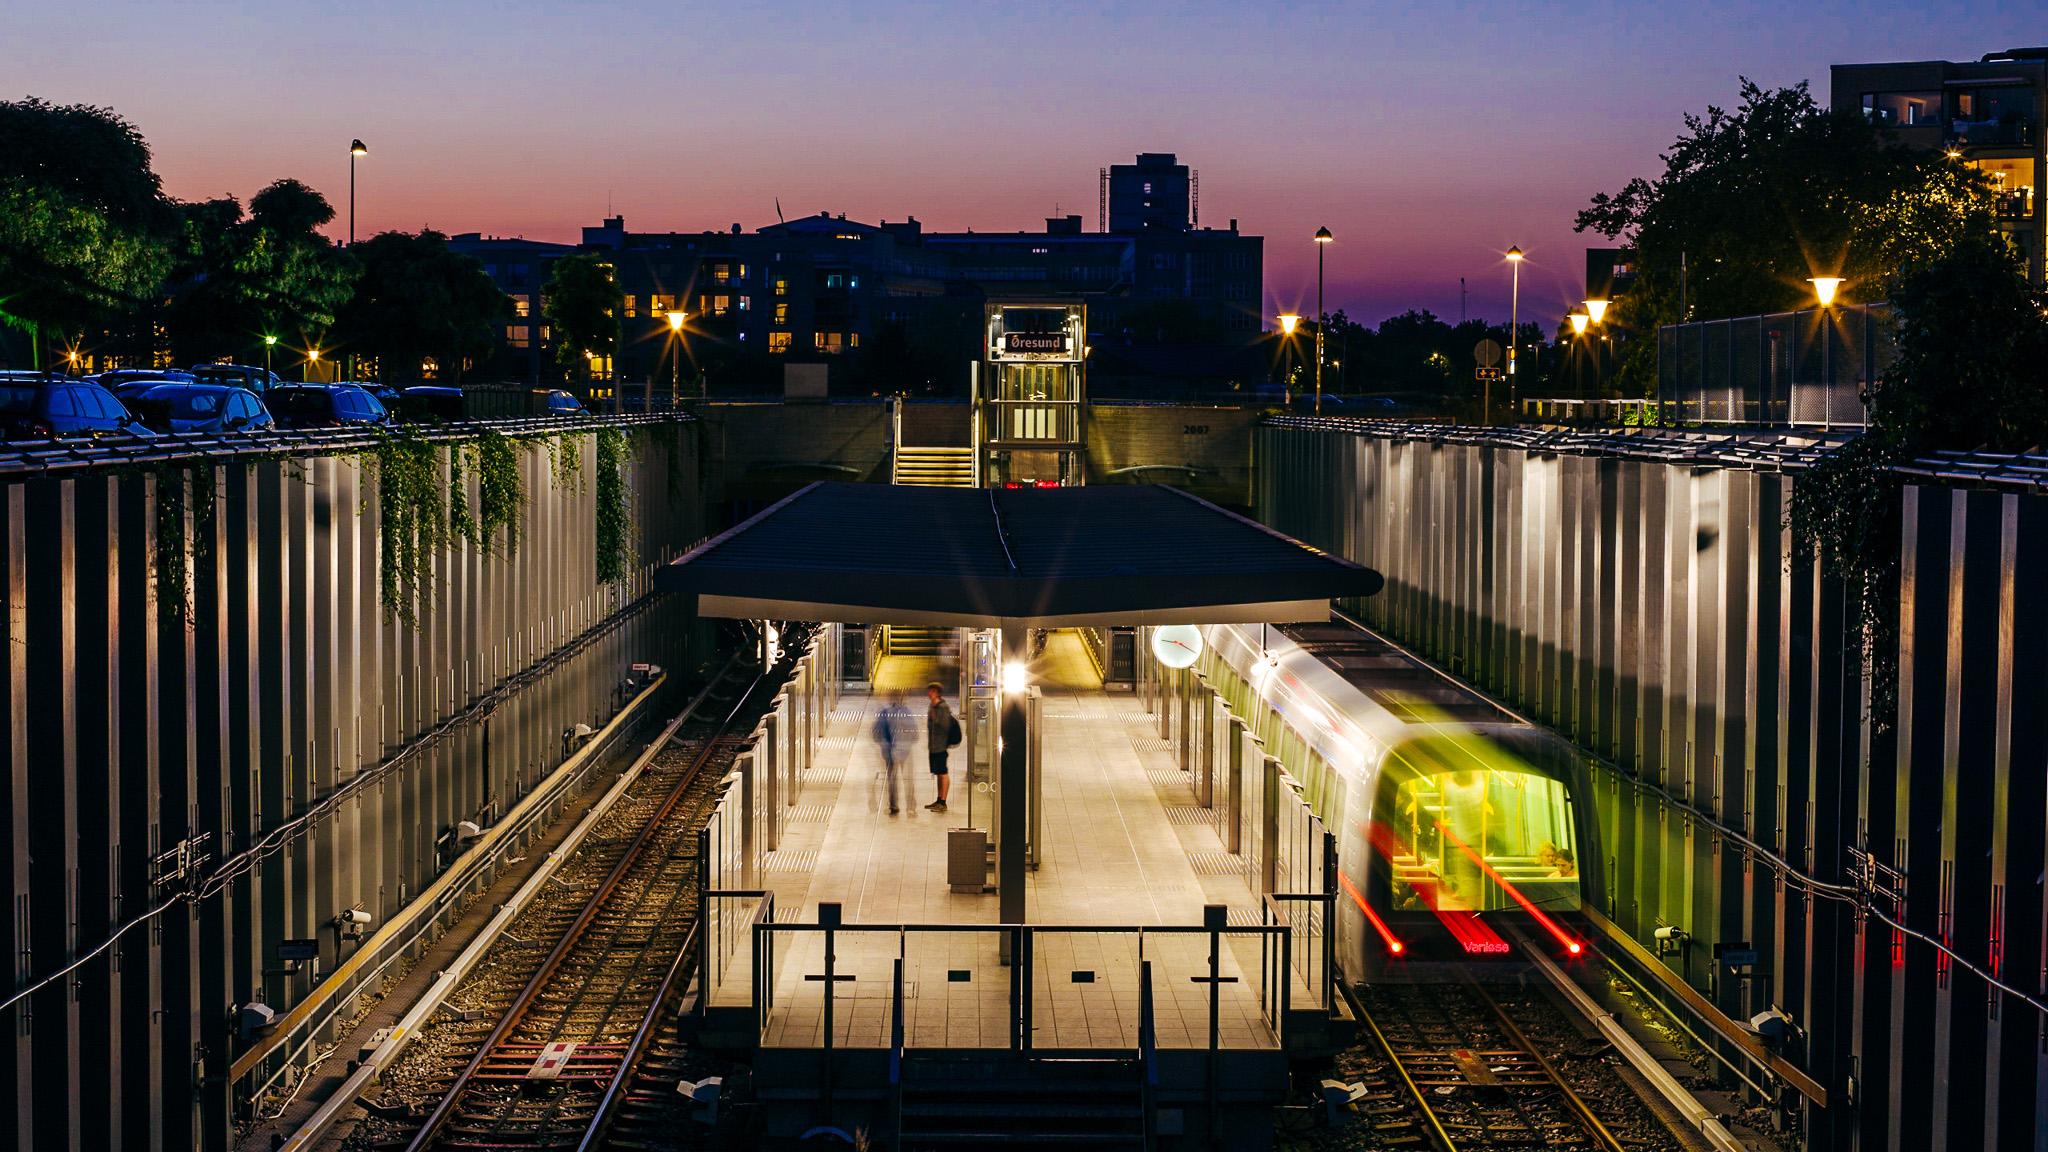 Øresund metro station